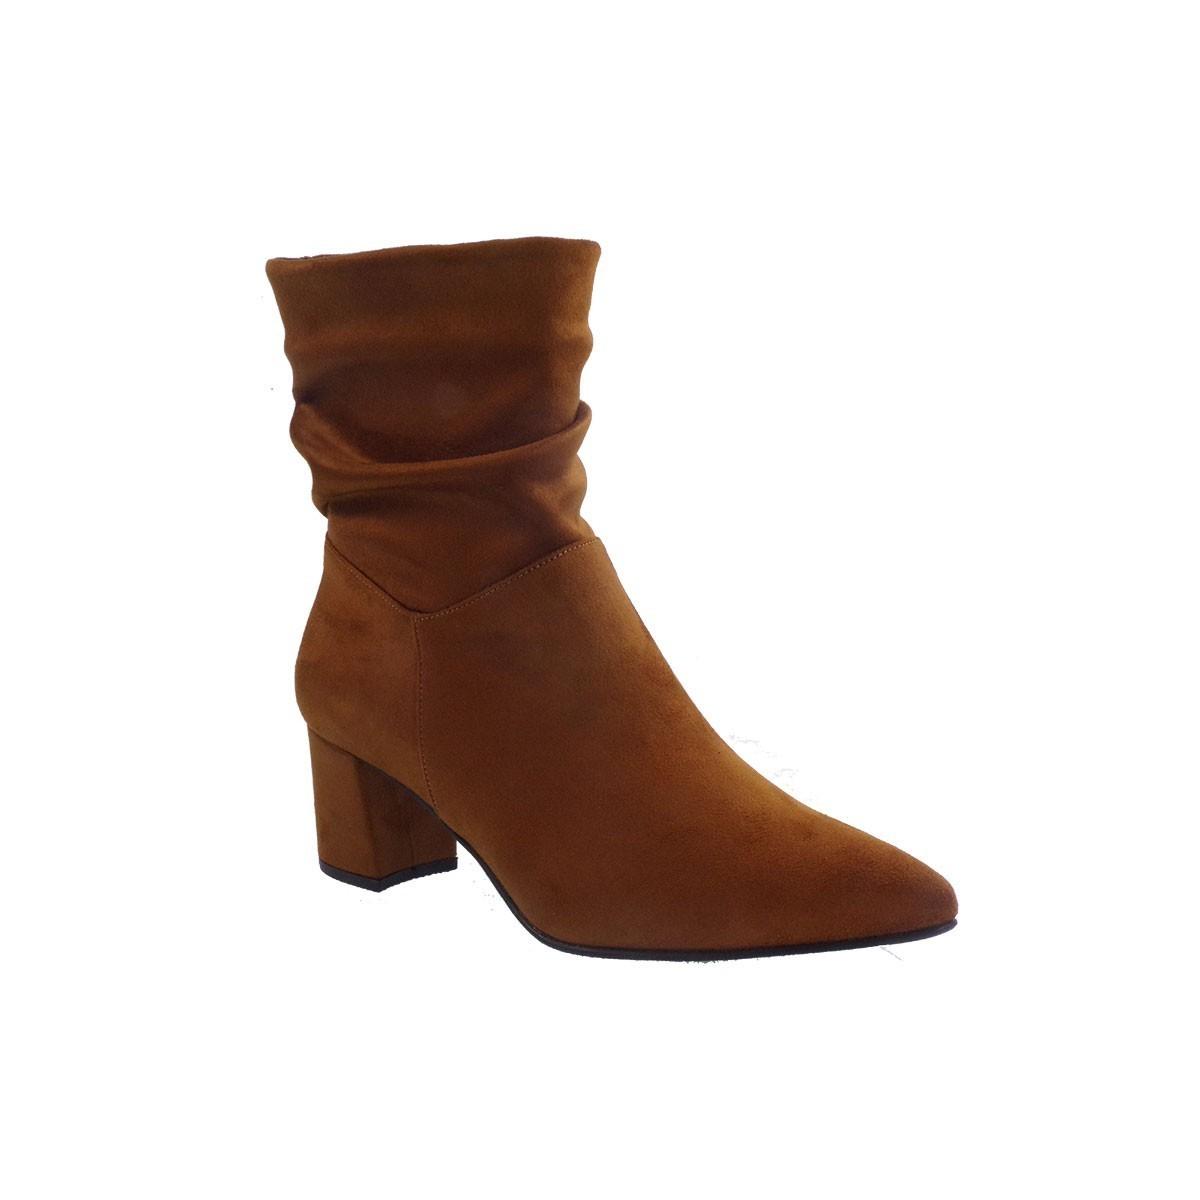 Fardoulis Shoes Γυναικεία Παπούτσια Μποτάκια 5703 Ταμπά Καστόρι Λικρα